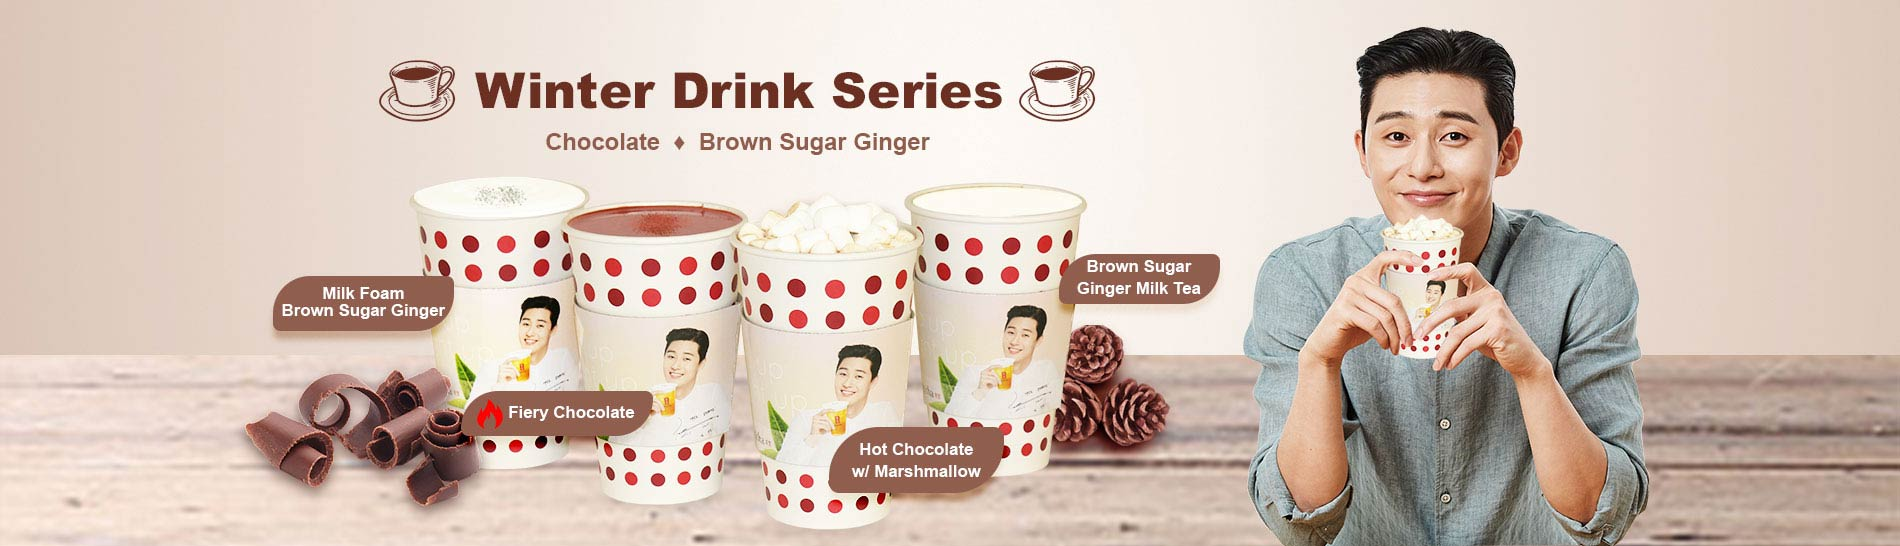 Winter Drink Series